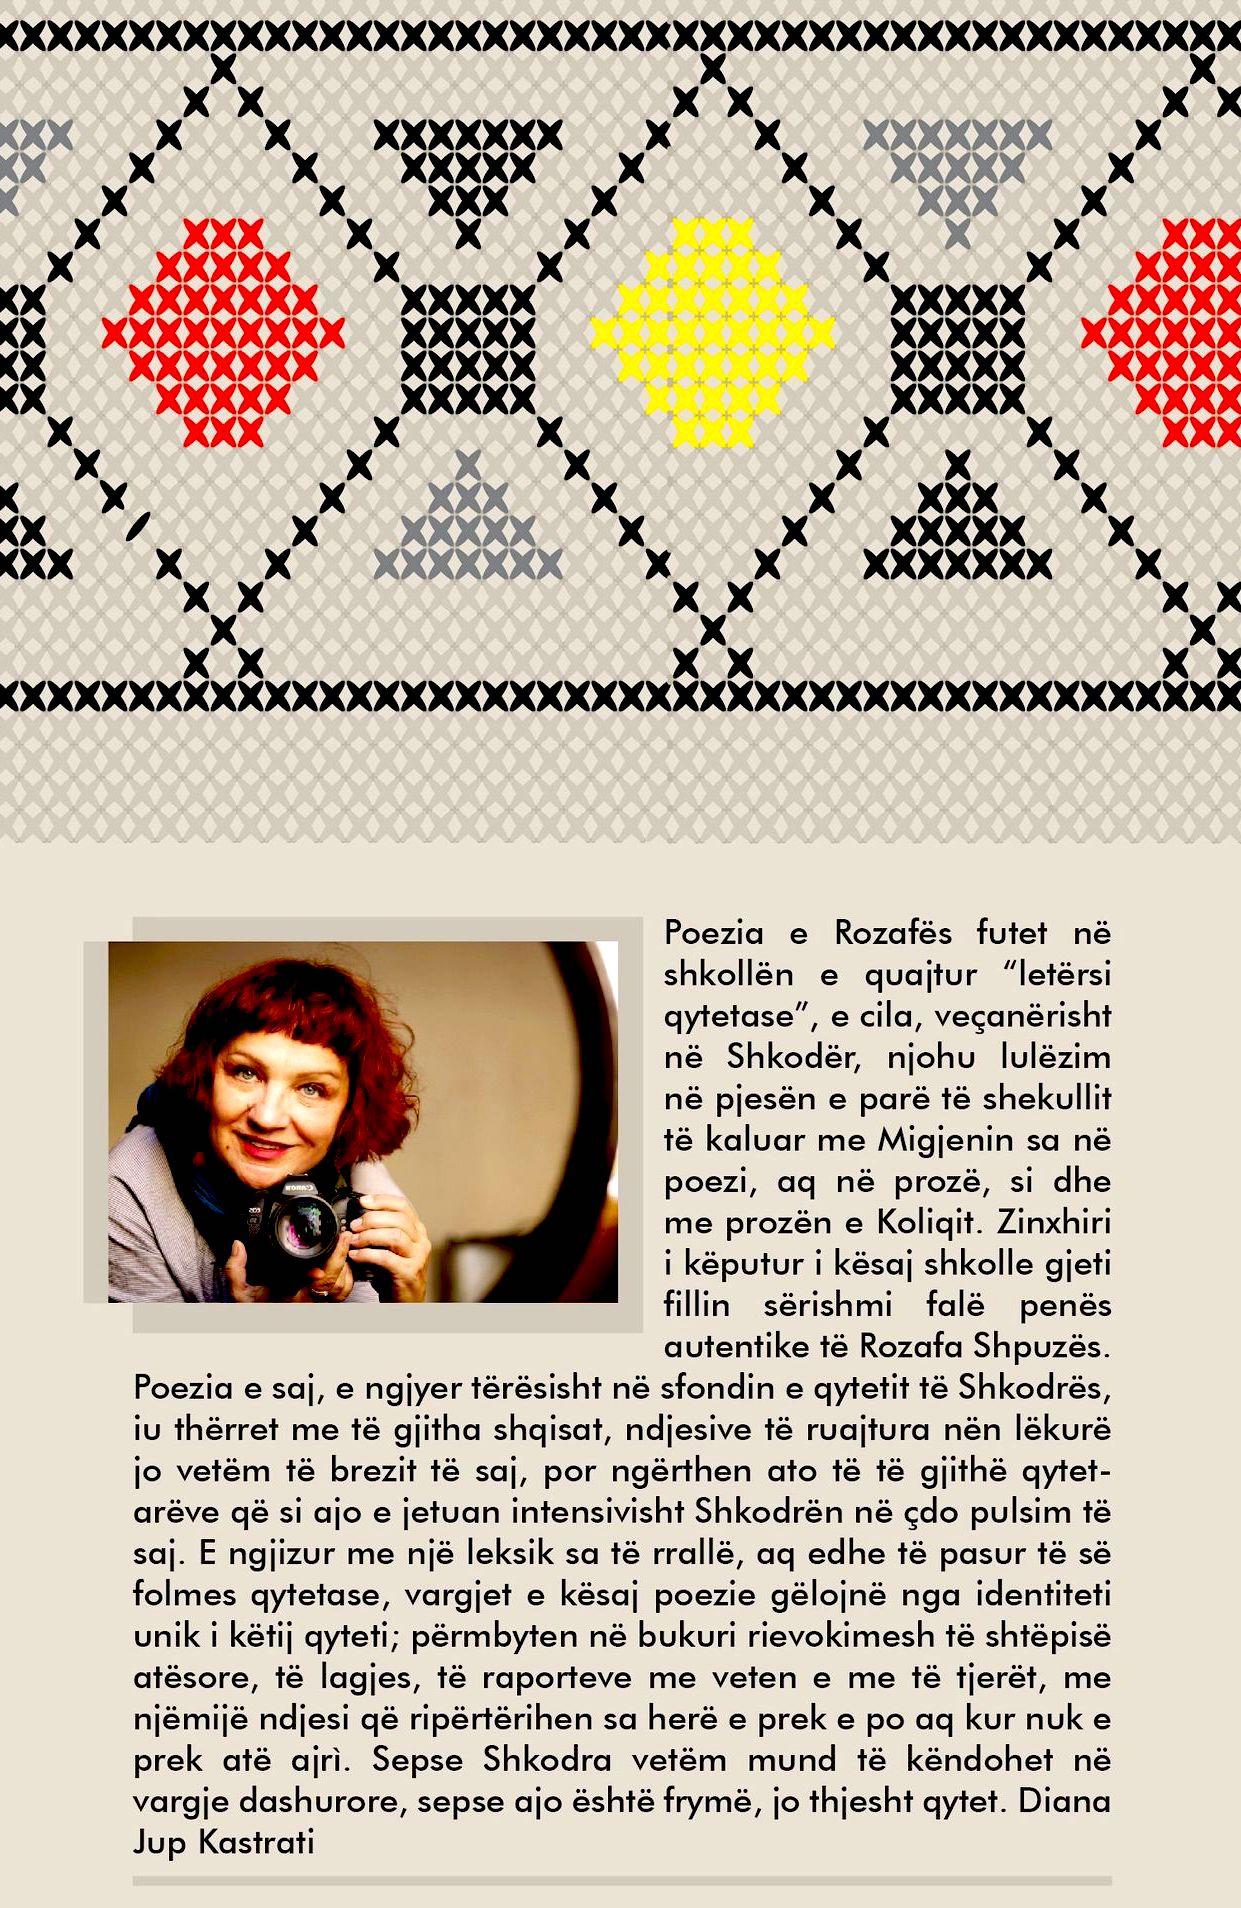 Rozafa Shpuza - Nana i qindiste kryq dimnat - Poezi